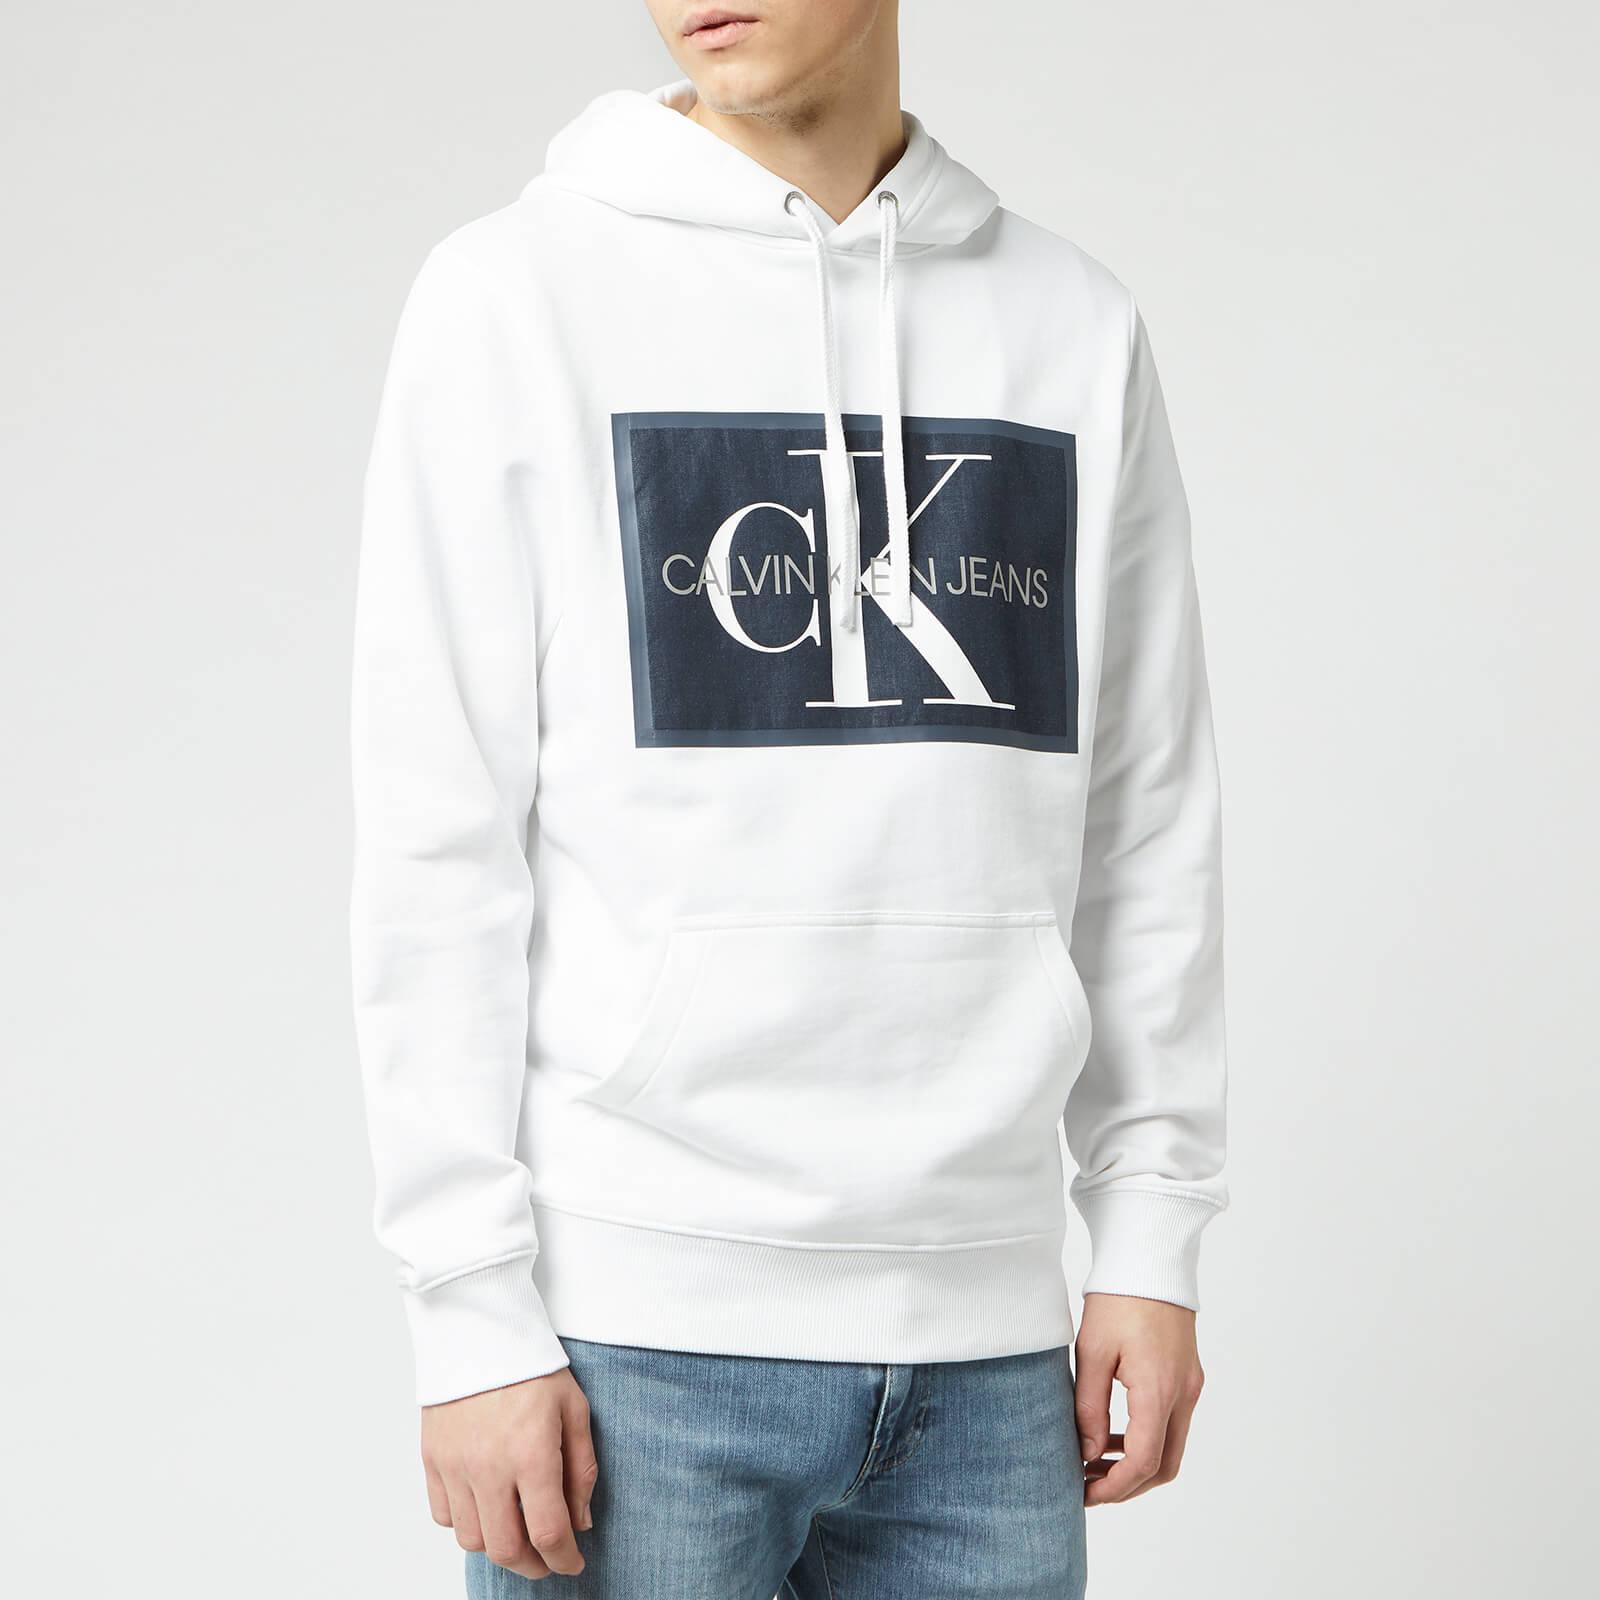 Calvin Klein Jeans Men's Monogram Patch Hoodie - Bright White - XL - White